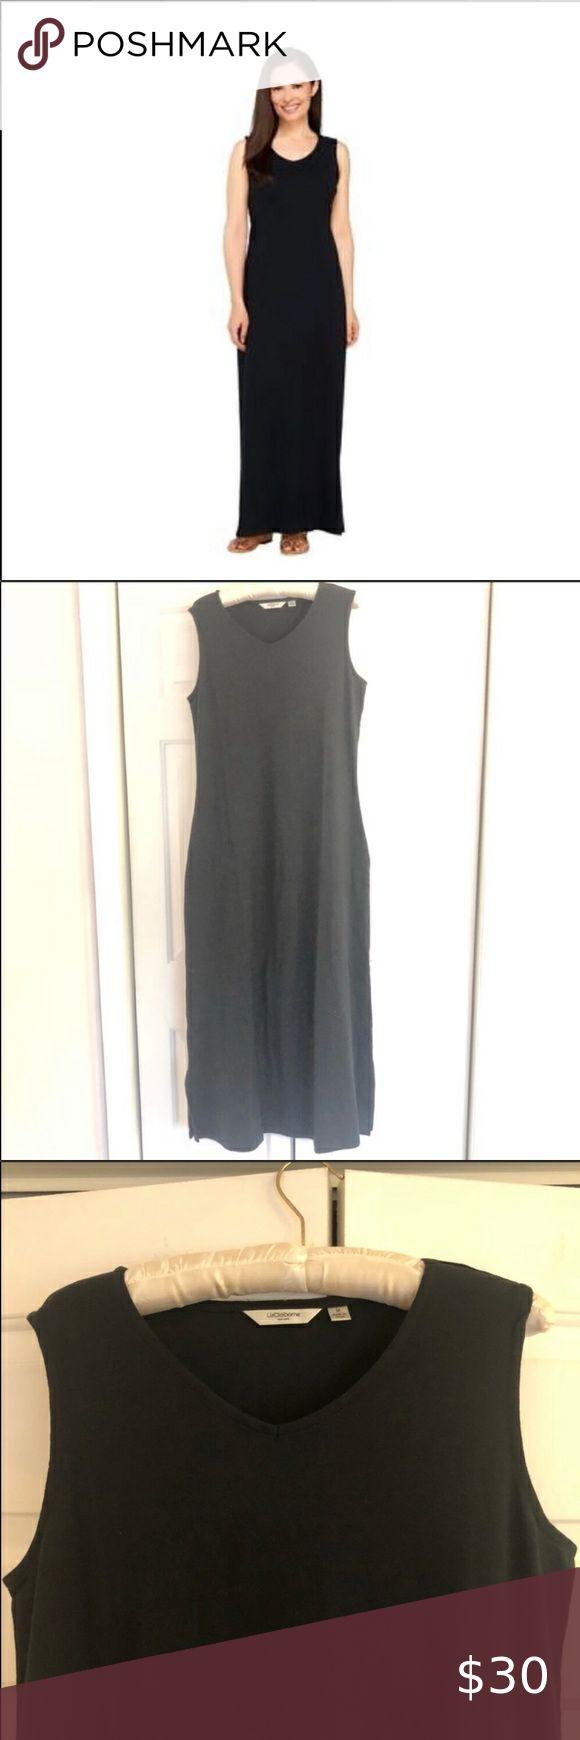 Liz Claiborne Black Ny New York V Neck Maxi Dress In 2021 Vneck Maxi Dress Liz Claiborne Dresses Maxi Dress [ 1740 x 580 Pixel ]